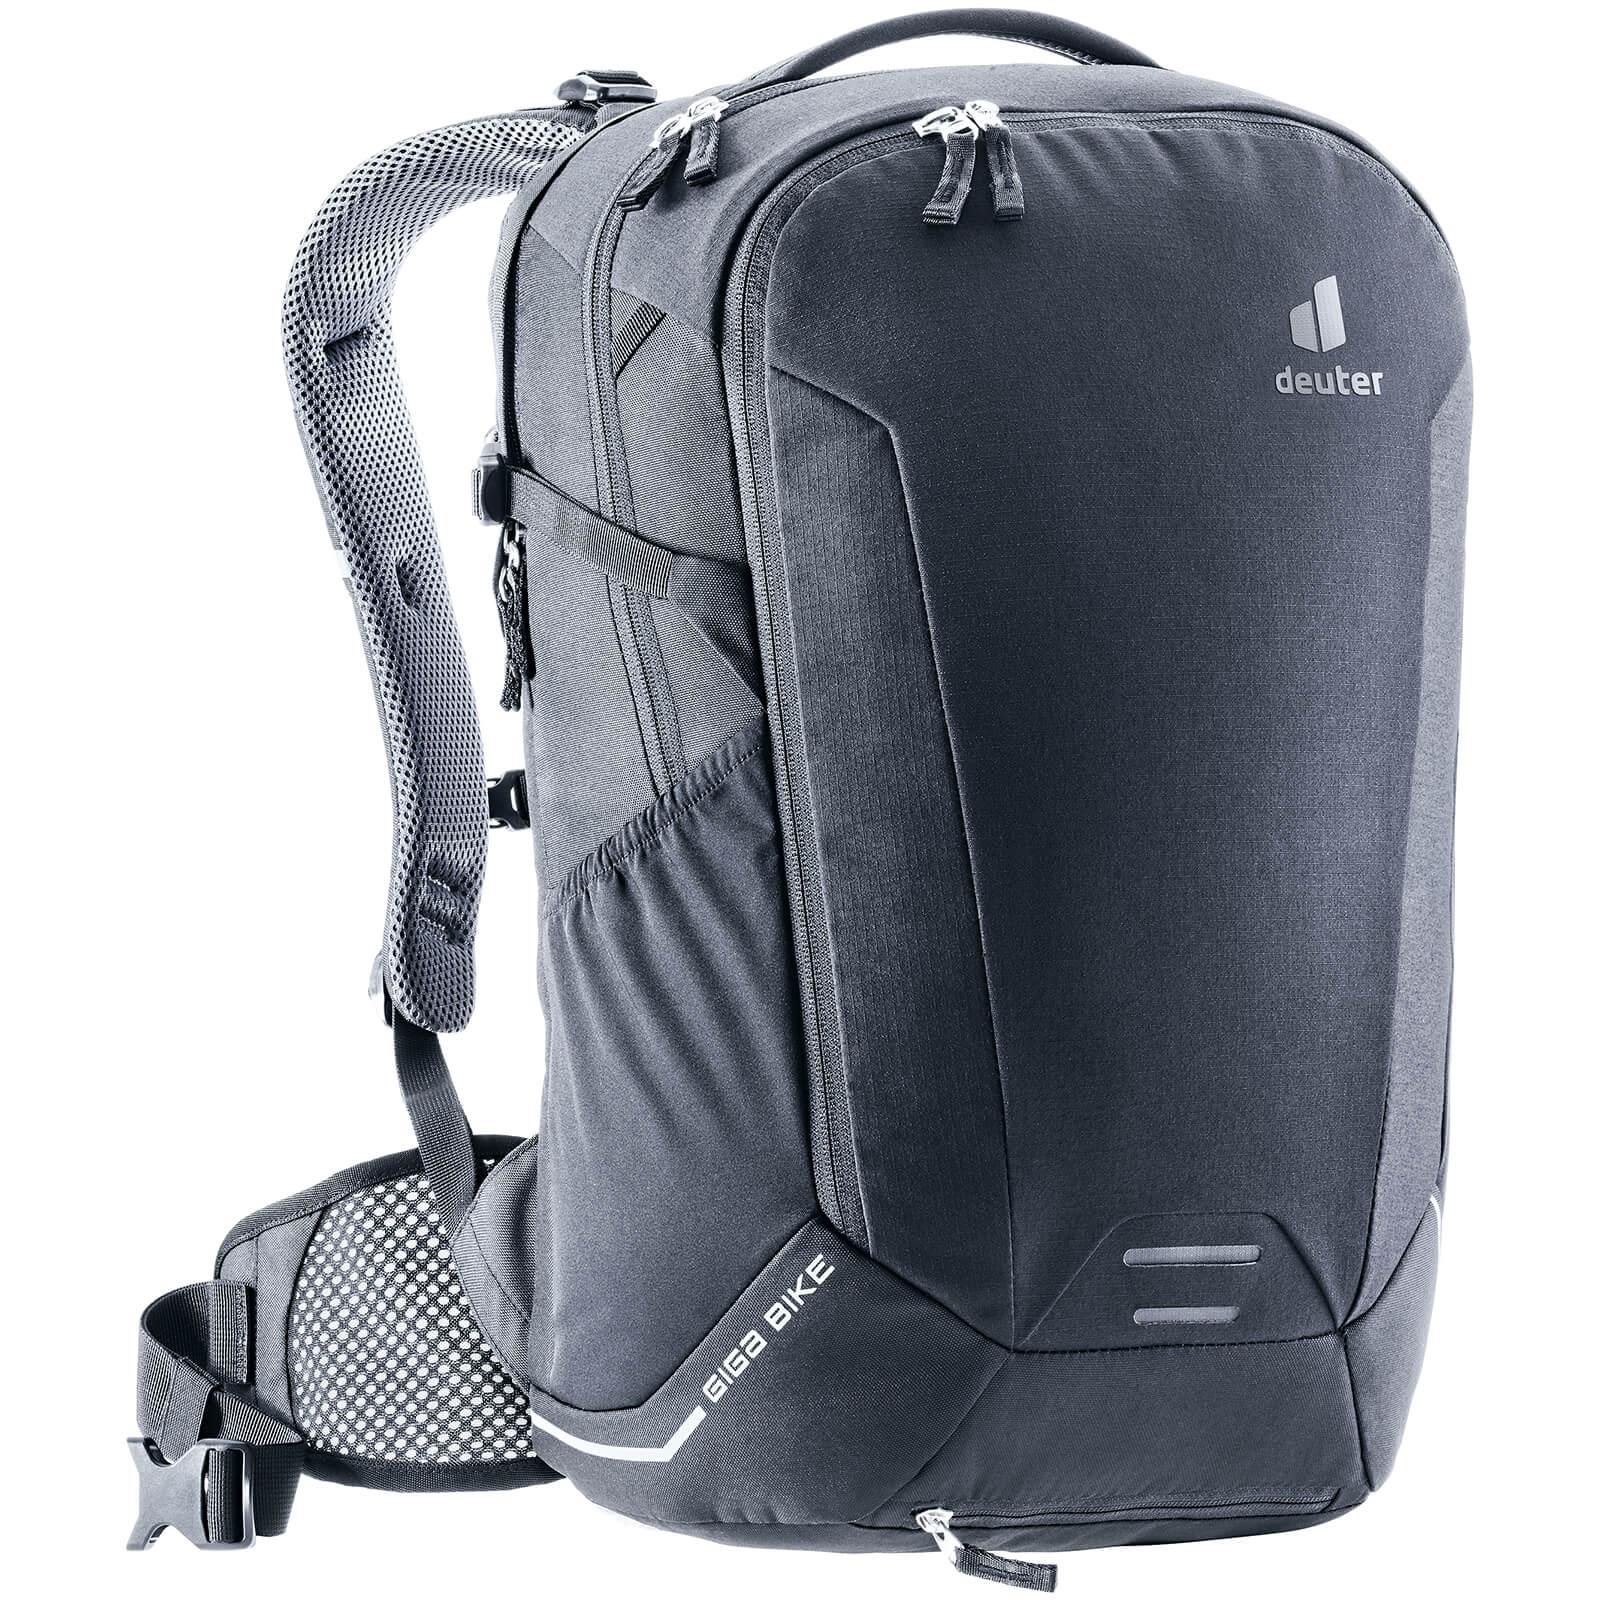 deuter Giga Bike Backpack - Black